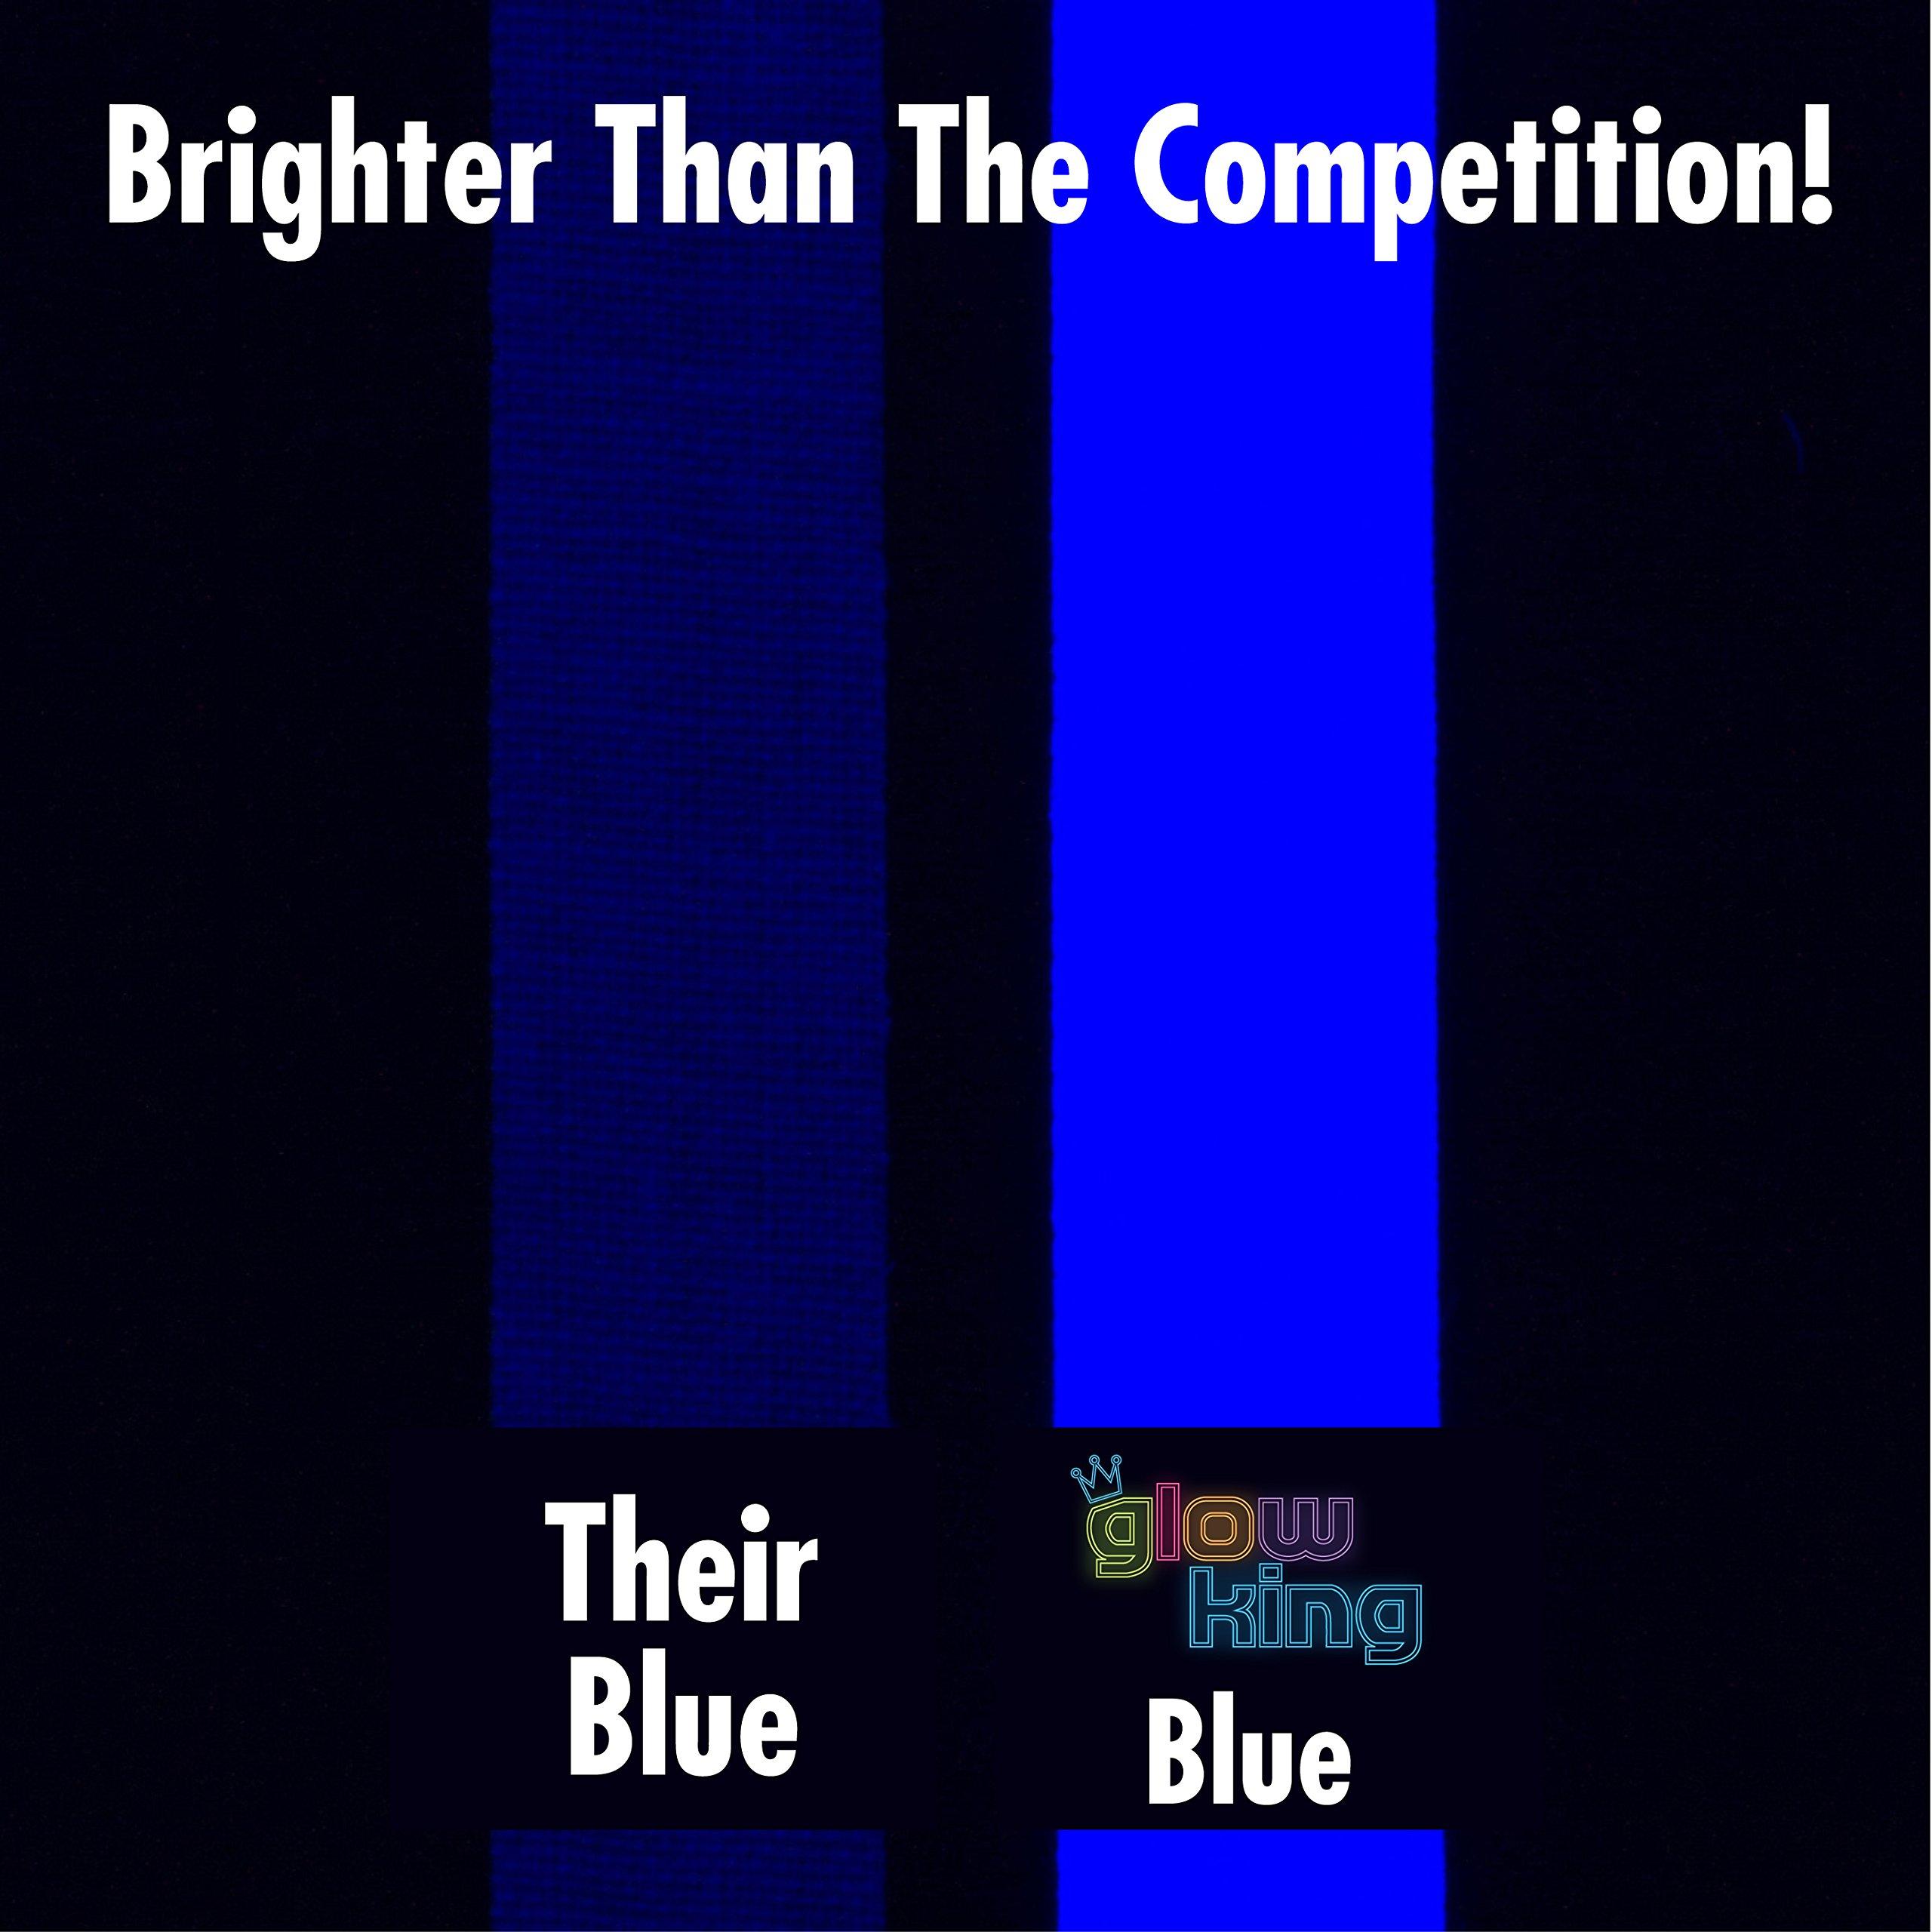 5-Pack SUPER BRIGHT UV Blacklight Reactive Fluorescent / Neon Gaffer Tape Matte Finish by Glow King (Image #5)